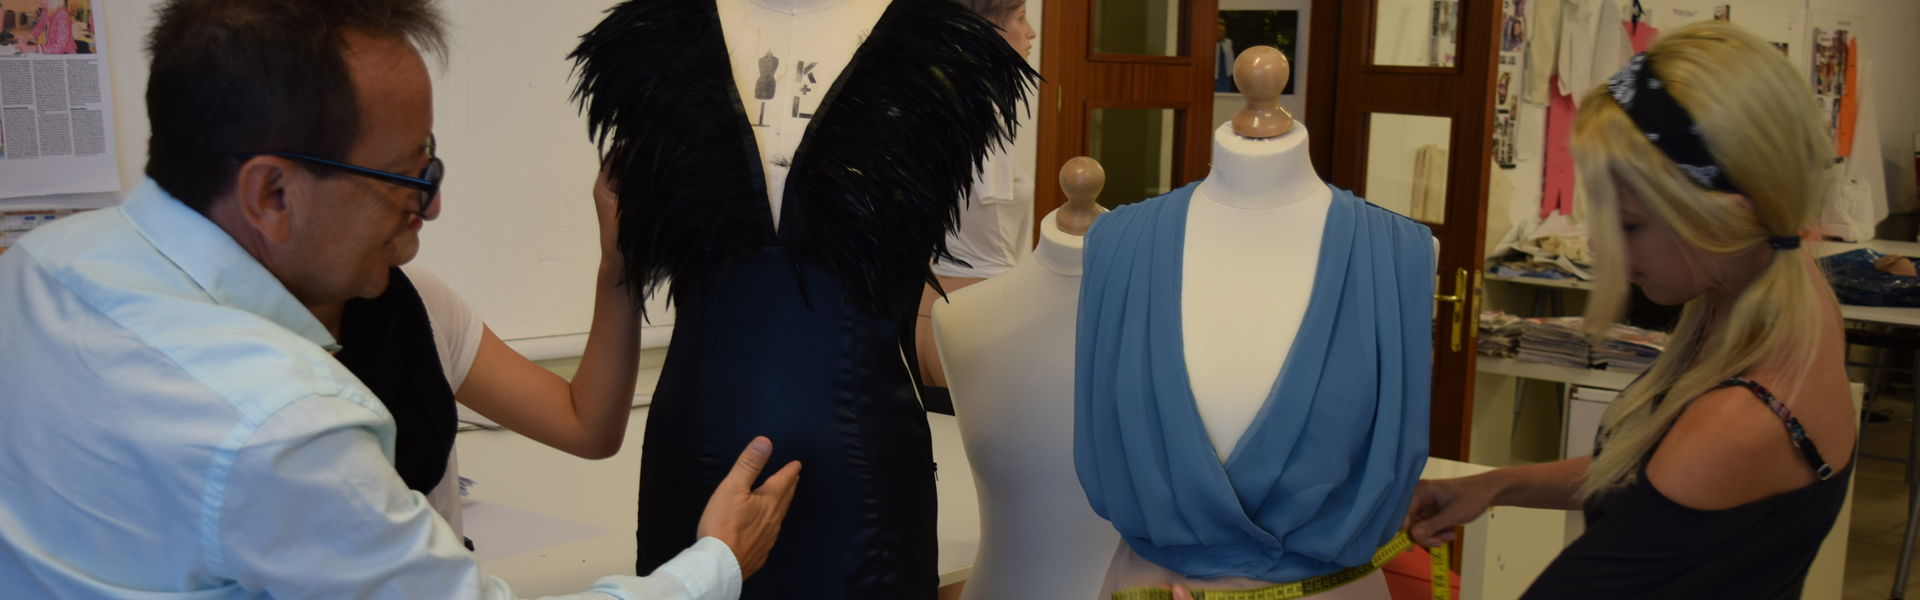 Fashion Design Course Marbella Design Academy